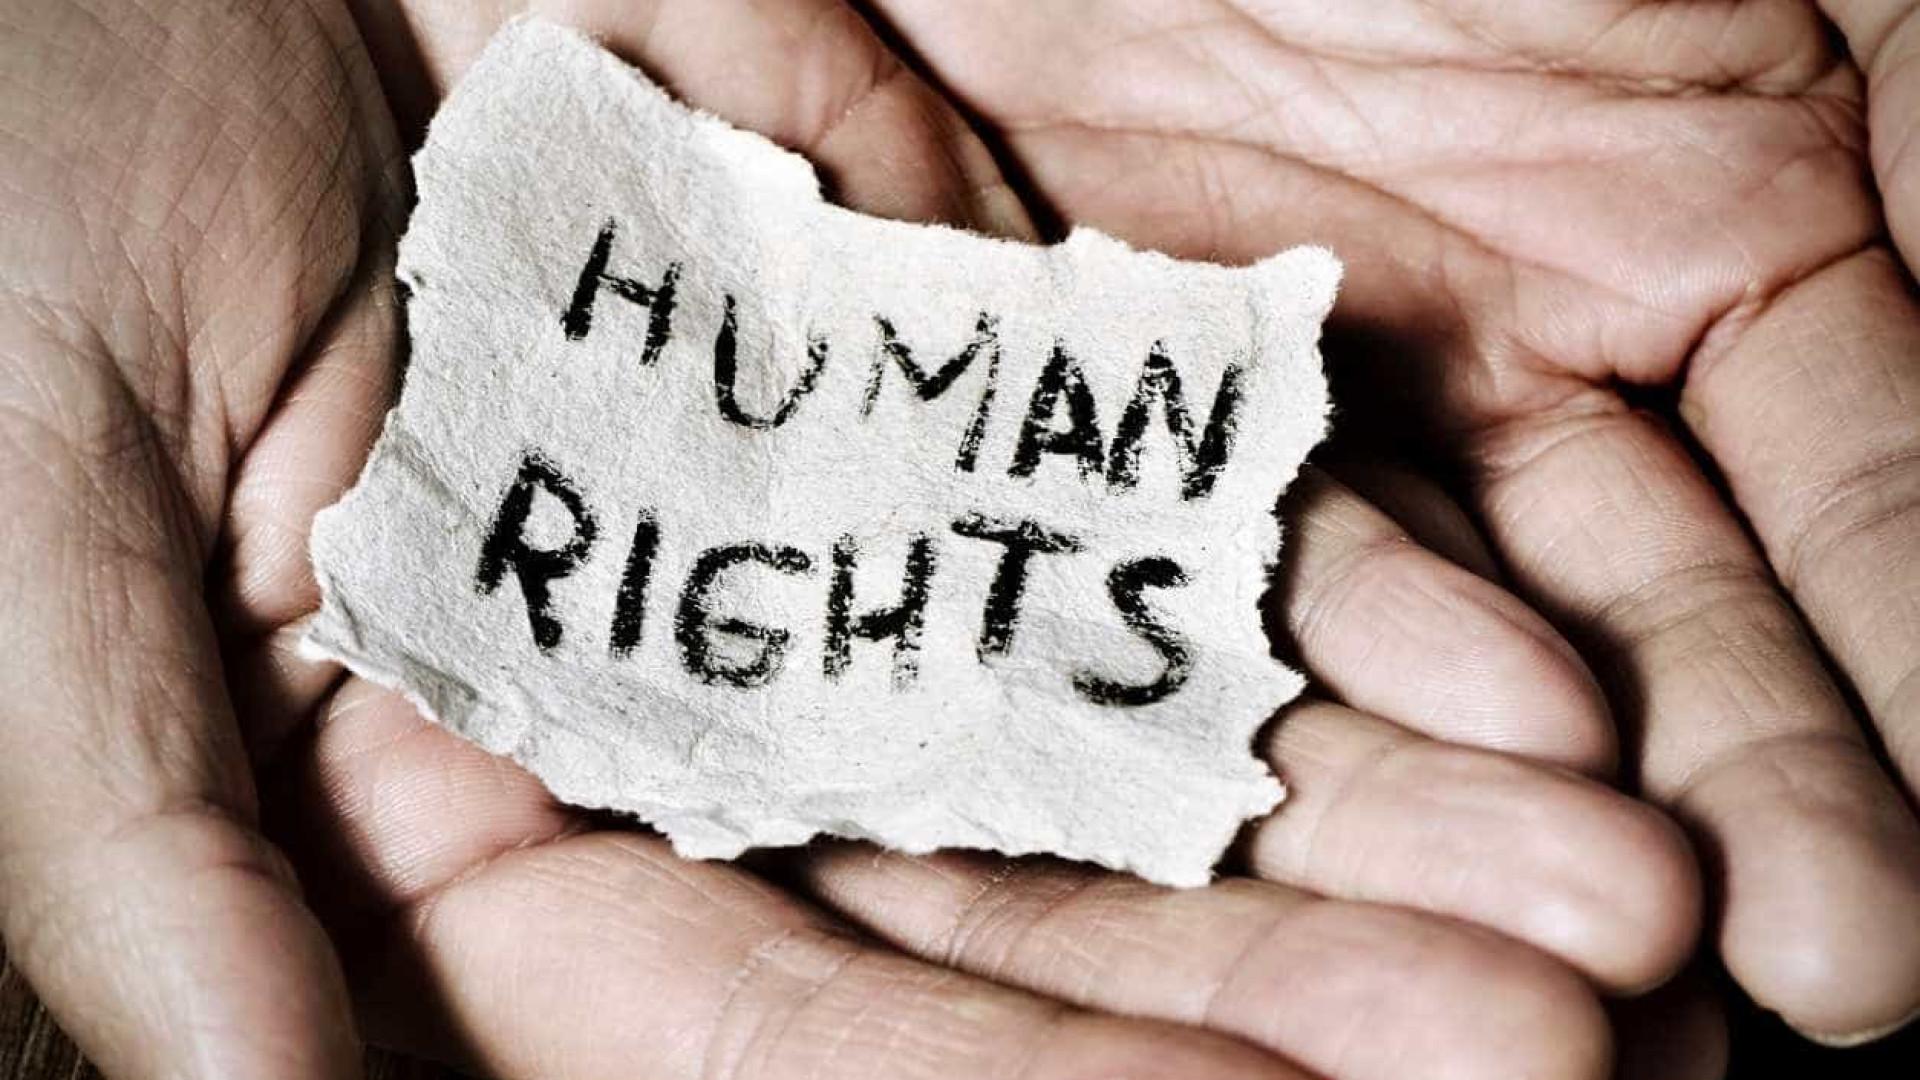 Human Rights Watch critica silêncio de países islâmicos sobre abusos